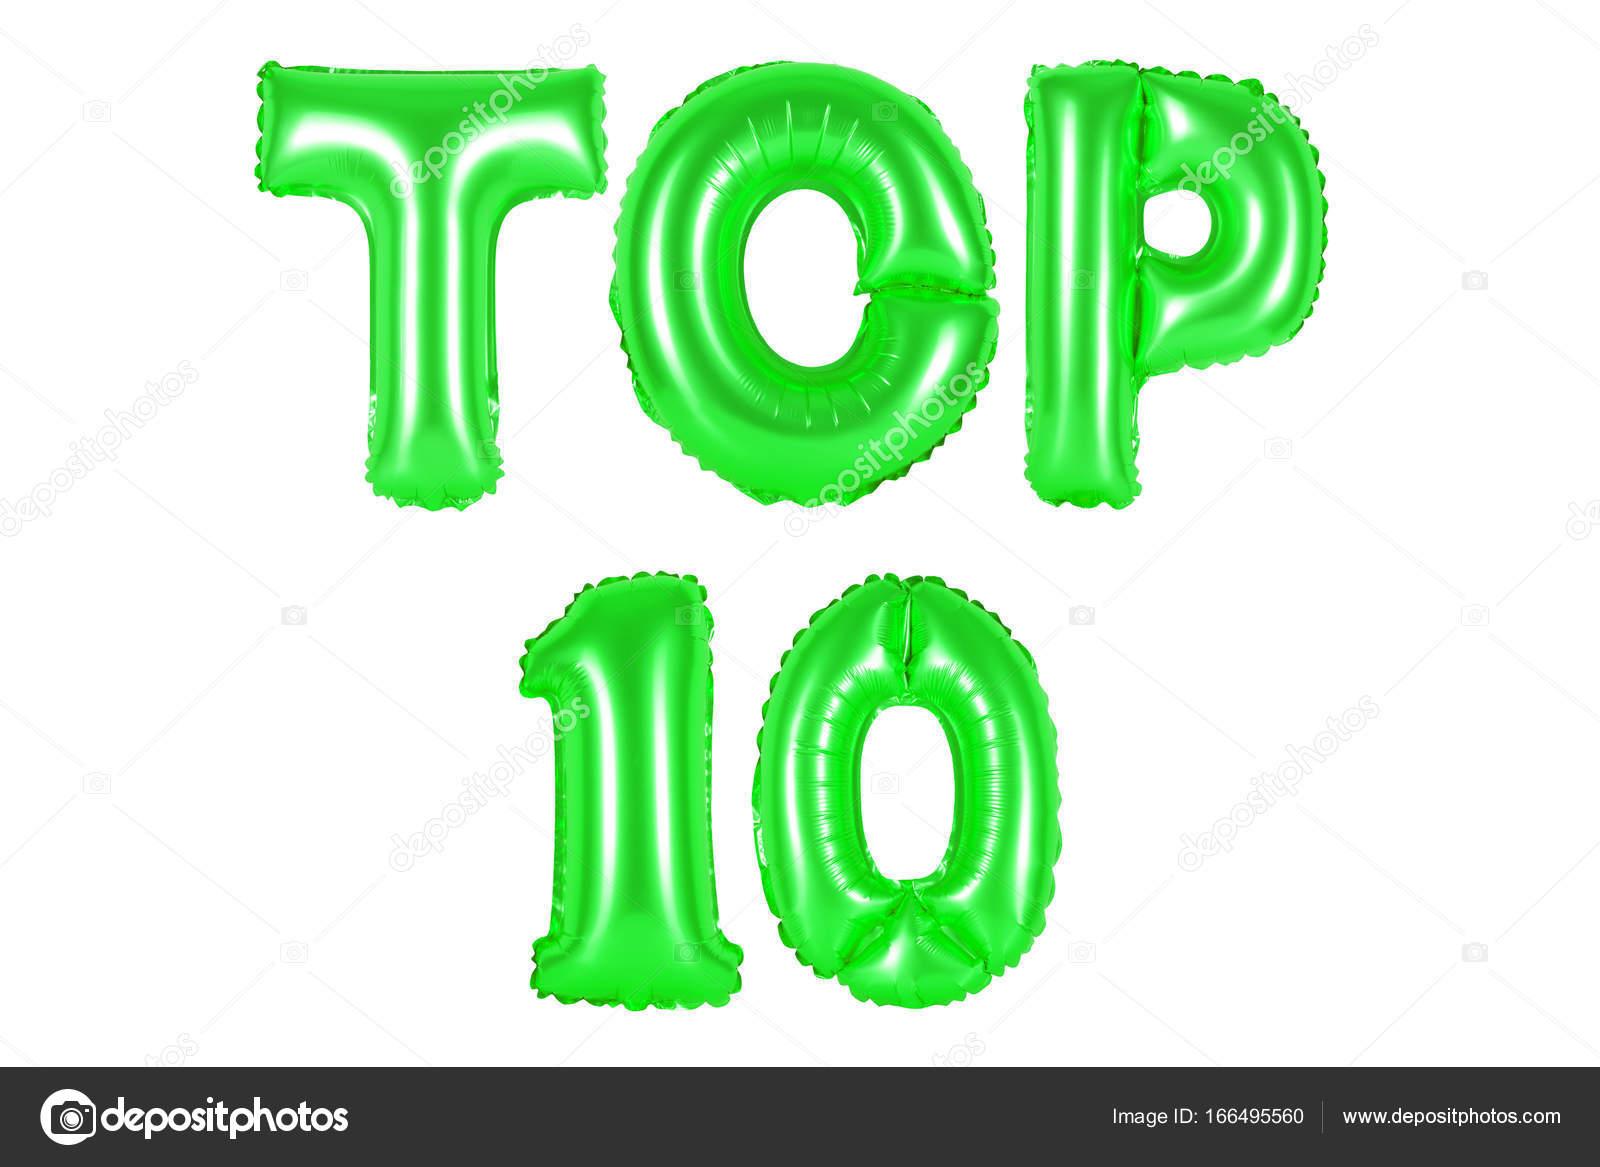 top 10, green color — Stock Photo © aquarius1983men #166495560